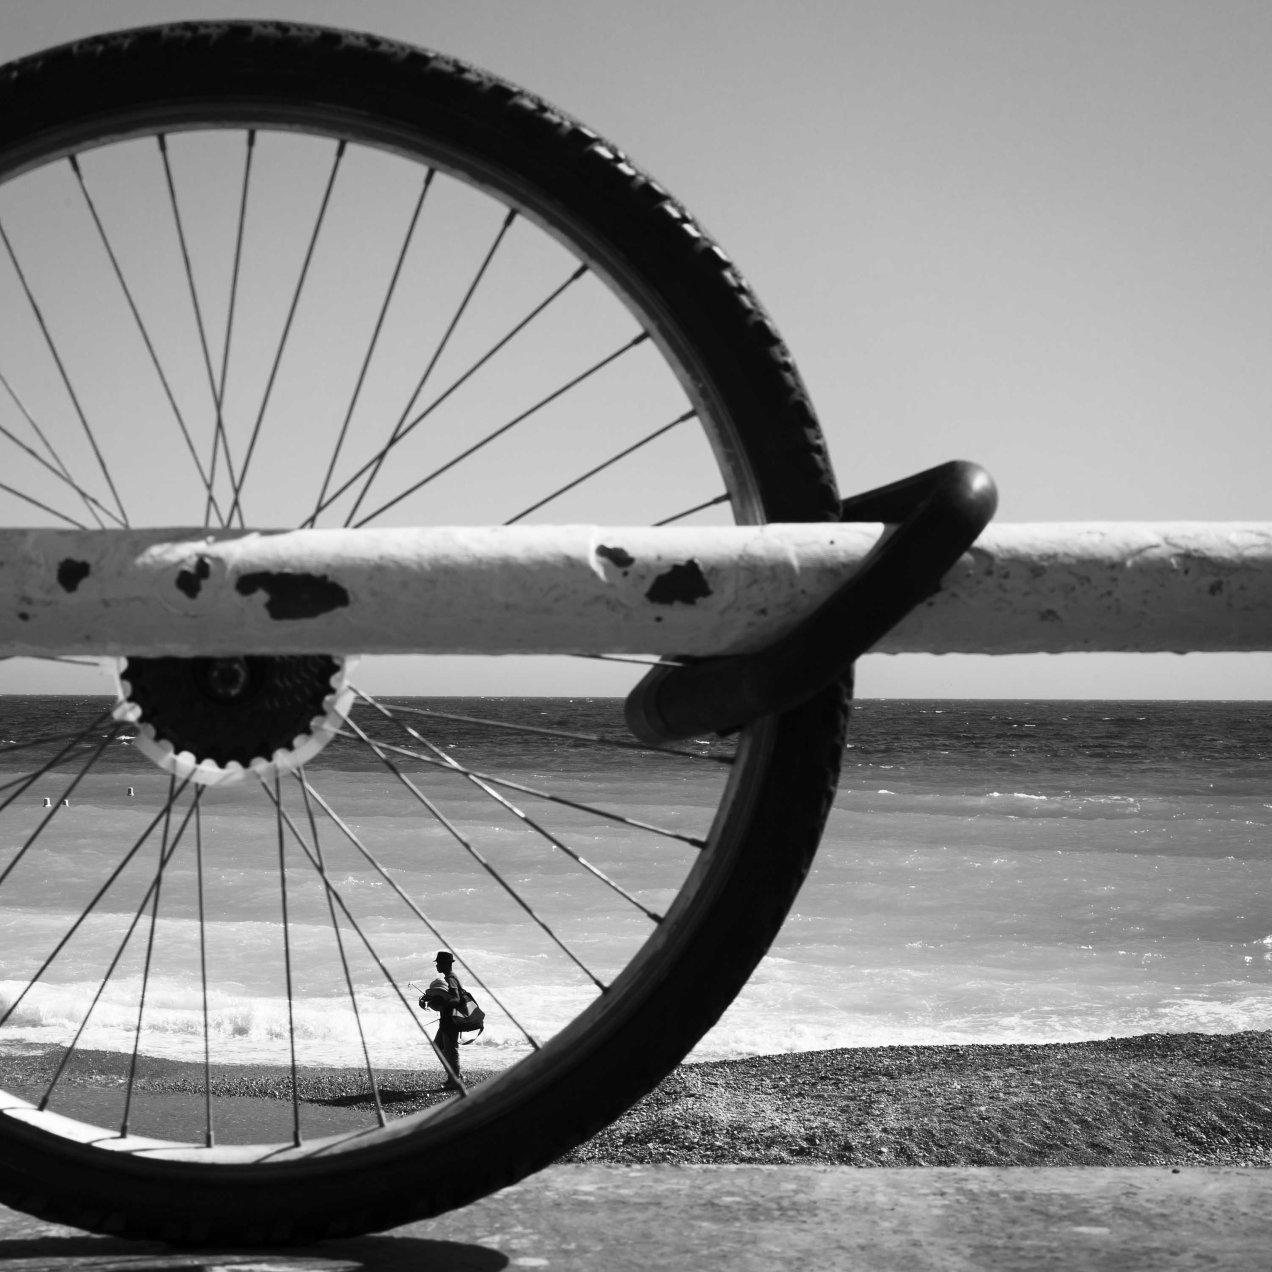 La roue de la fortune, gildalliere-Modifier.jpg